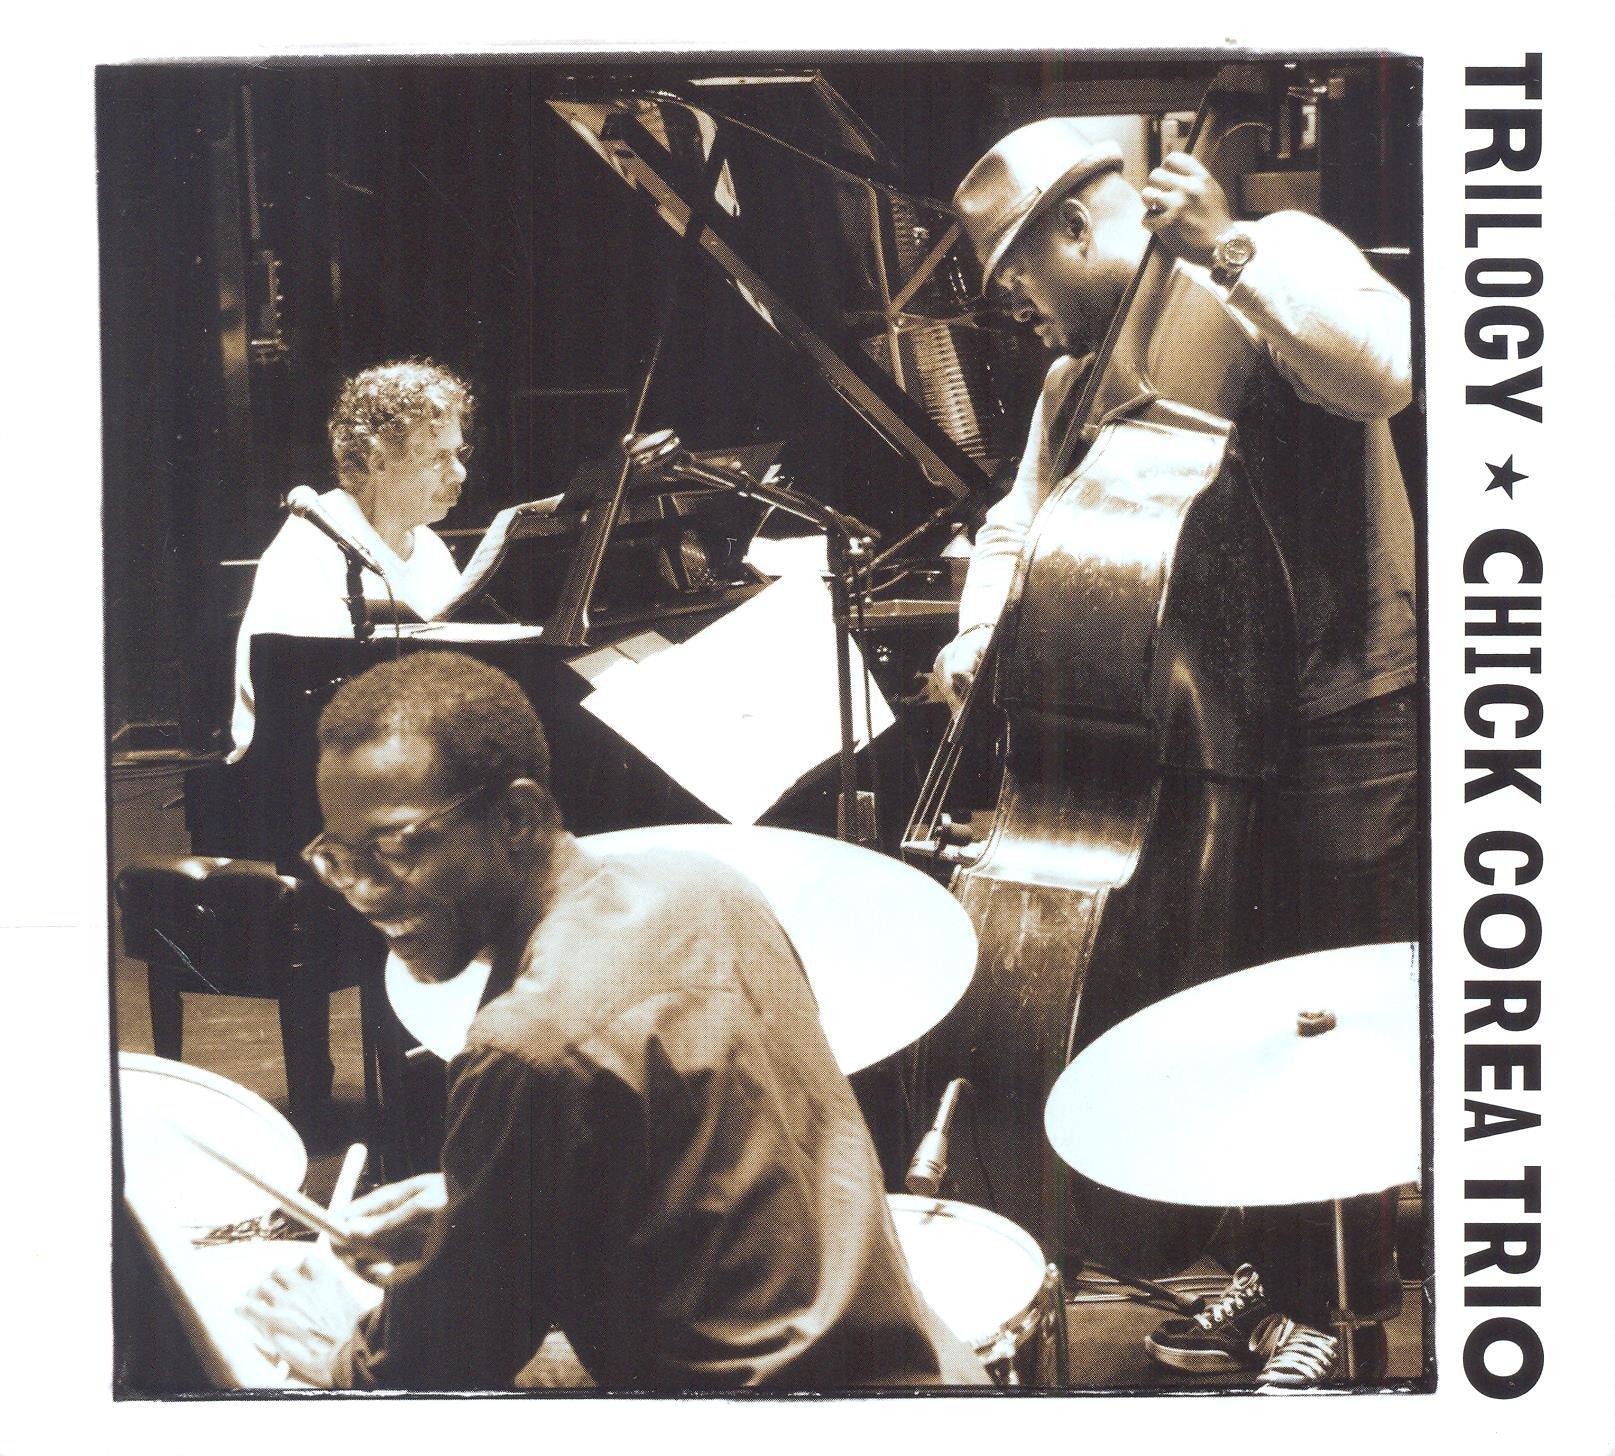 CD : Chick Corea - Trilogy (Digipack Packaging, 3 Disc)